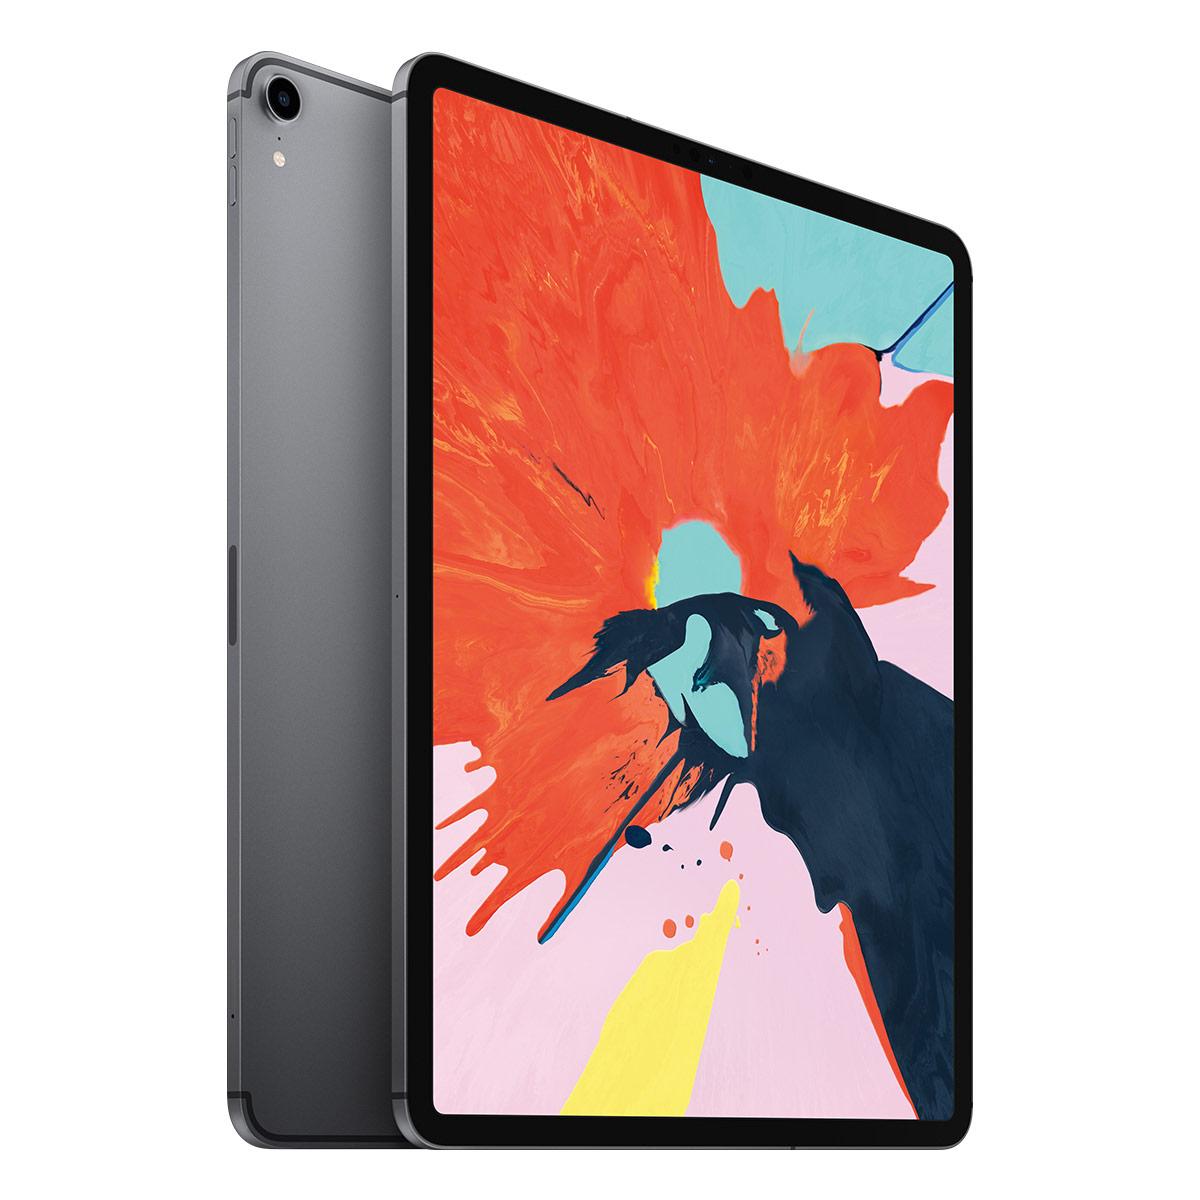 "Apple iPad Pro 12.9"" 512GB WiFi + Cellular - Space Grey"